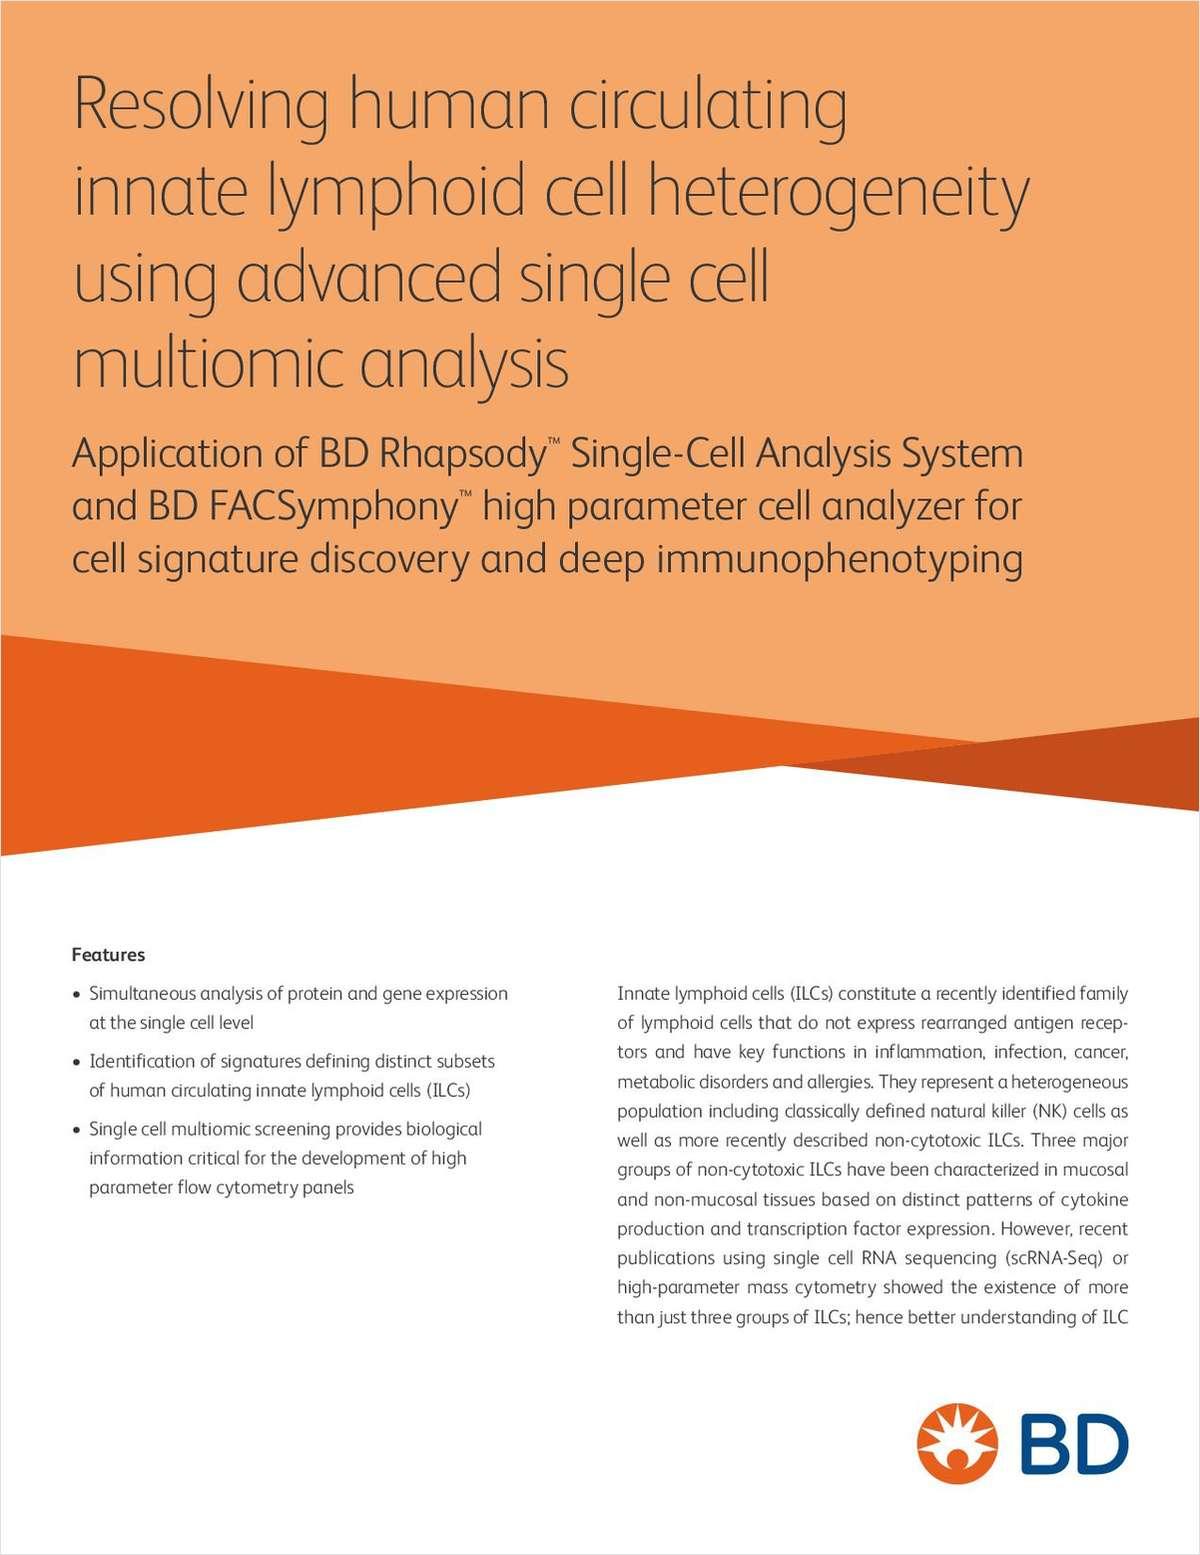 Resolving Human Circulating Innate Lymphoid Cell Heterogeneity Using Advanced Single Cell Multiomic Analysis